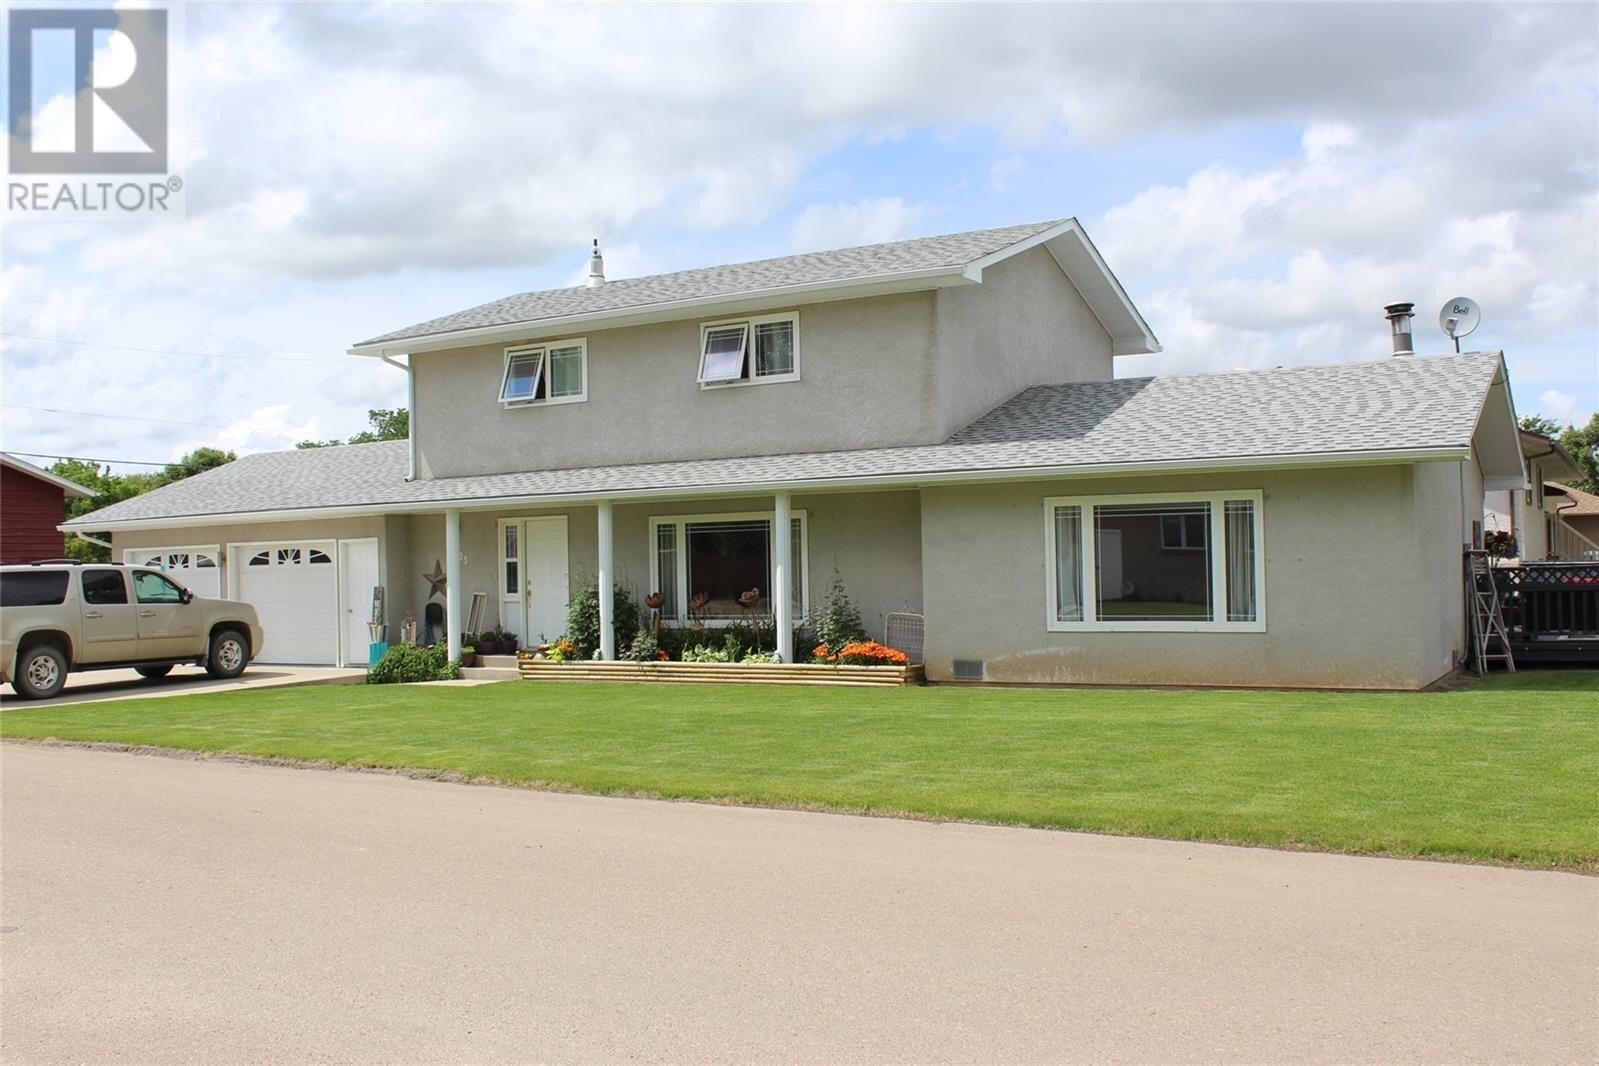 House for sale at 405 4th Ave E Shaunavon Saskatchewan - MLS: SK817729